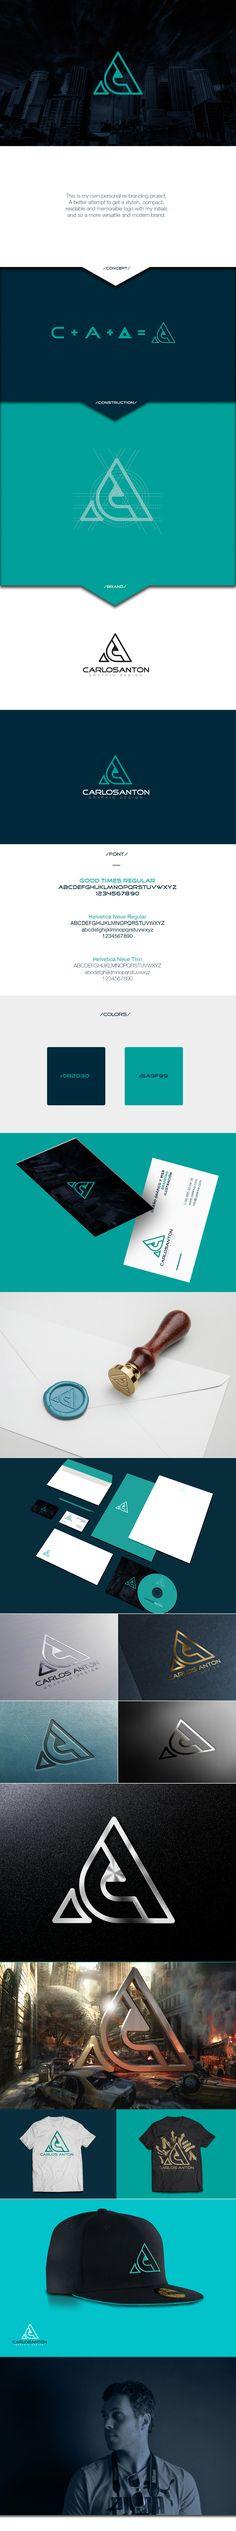 Personal Branding - Carlos Antón on Behance